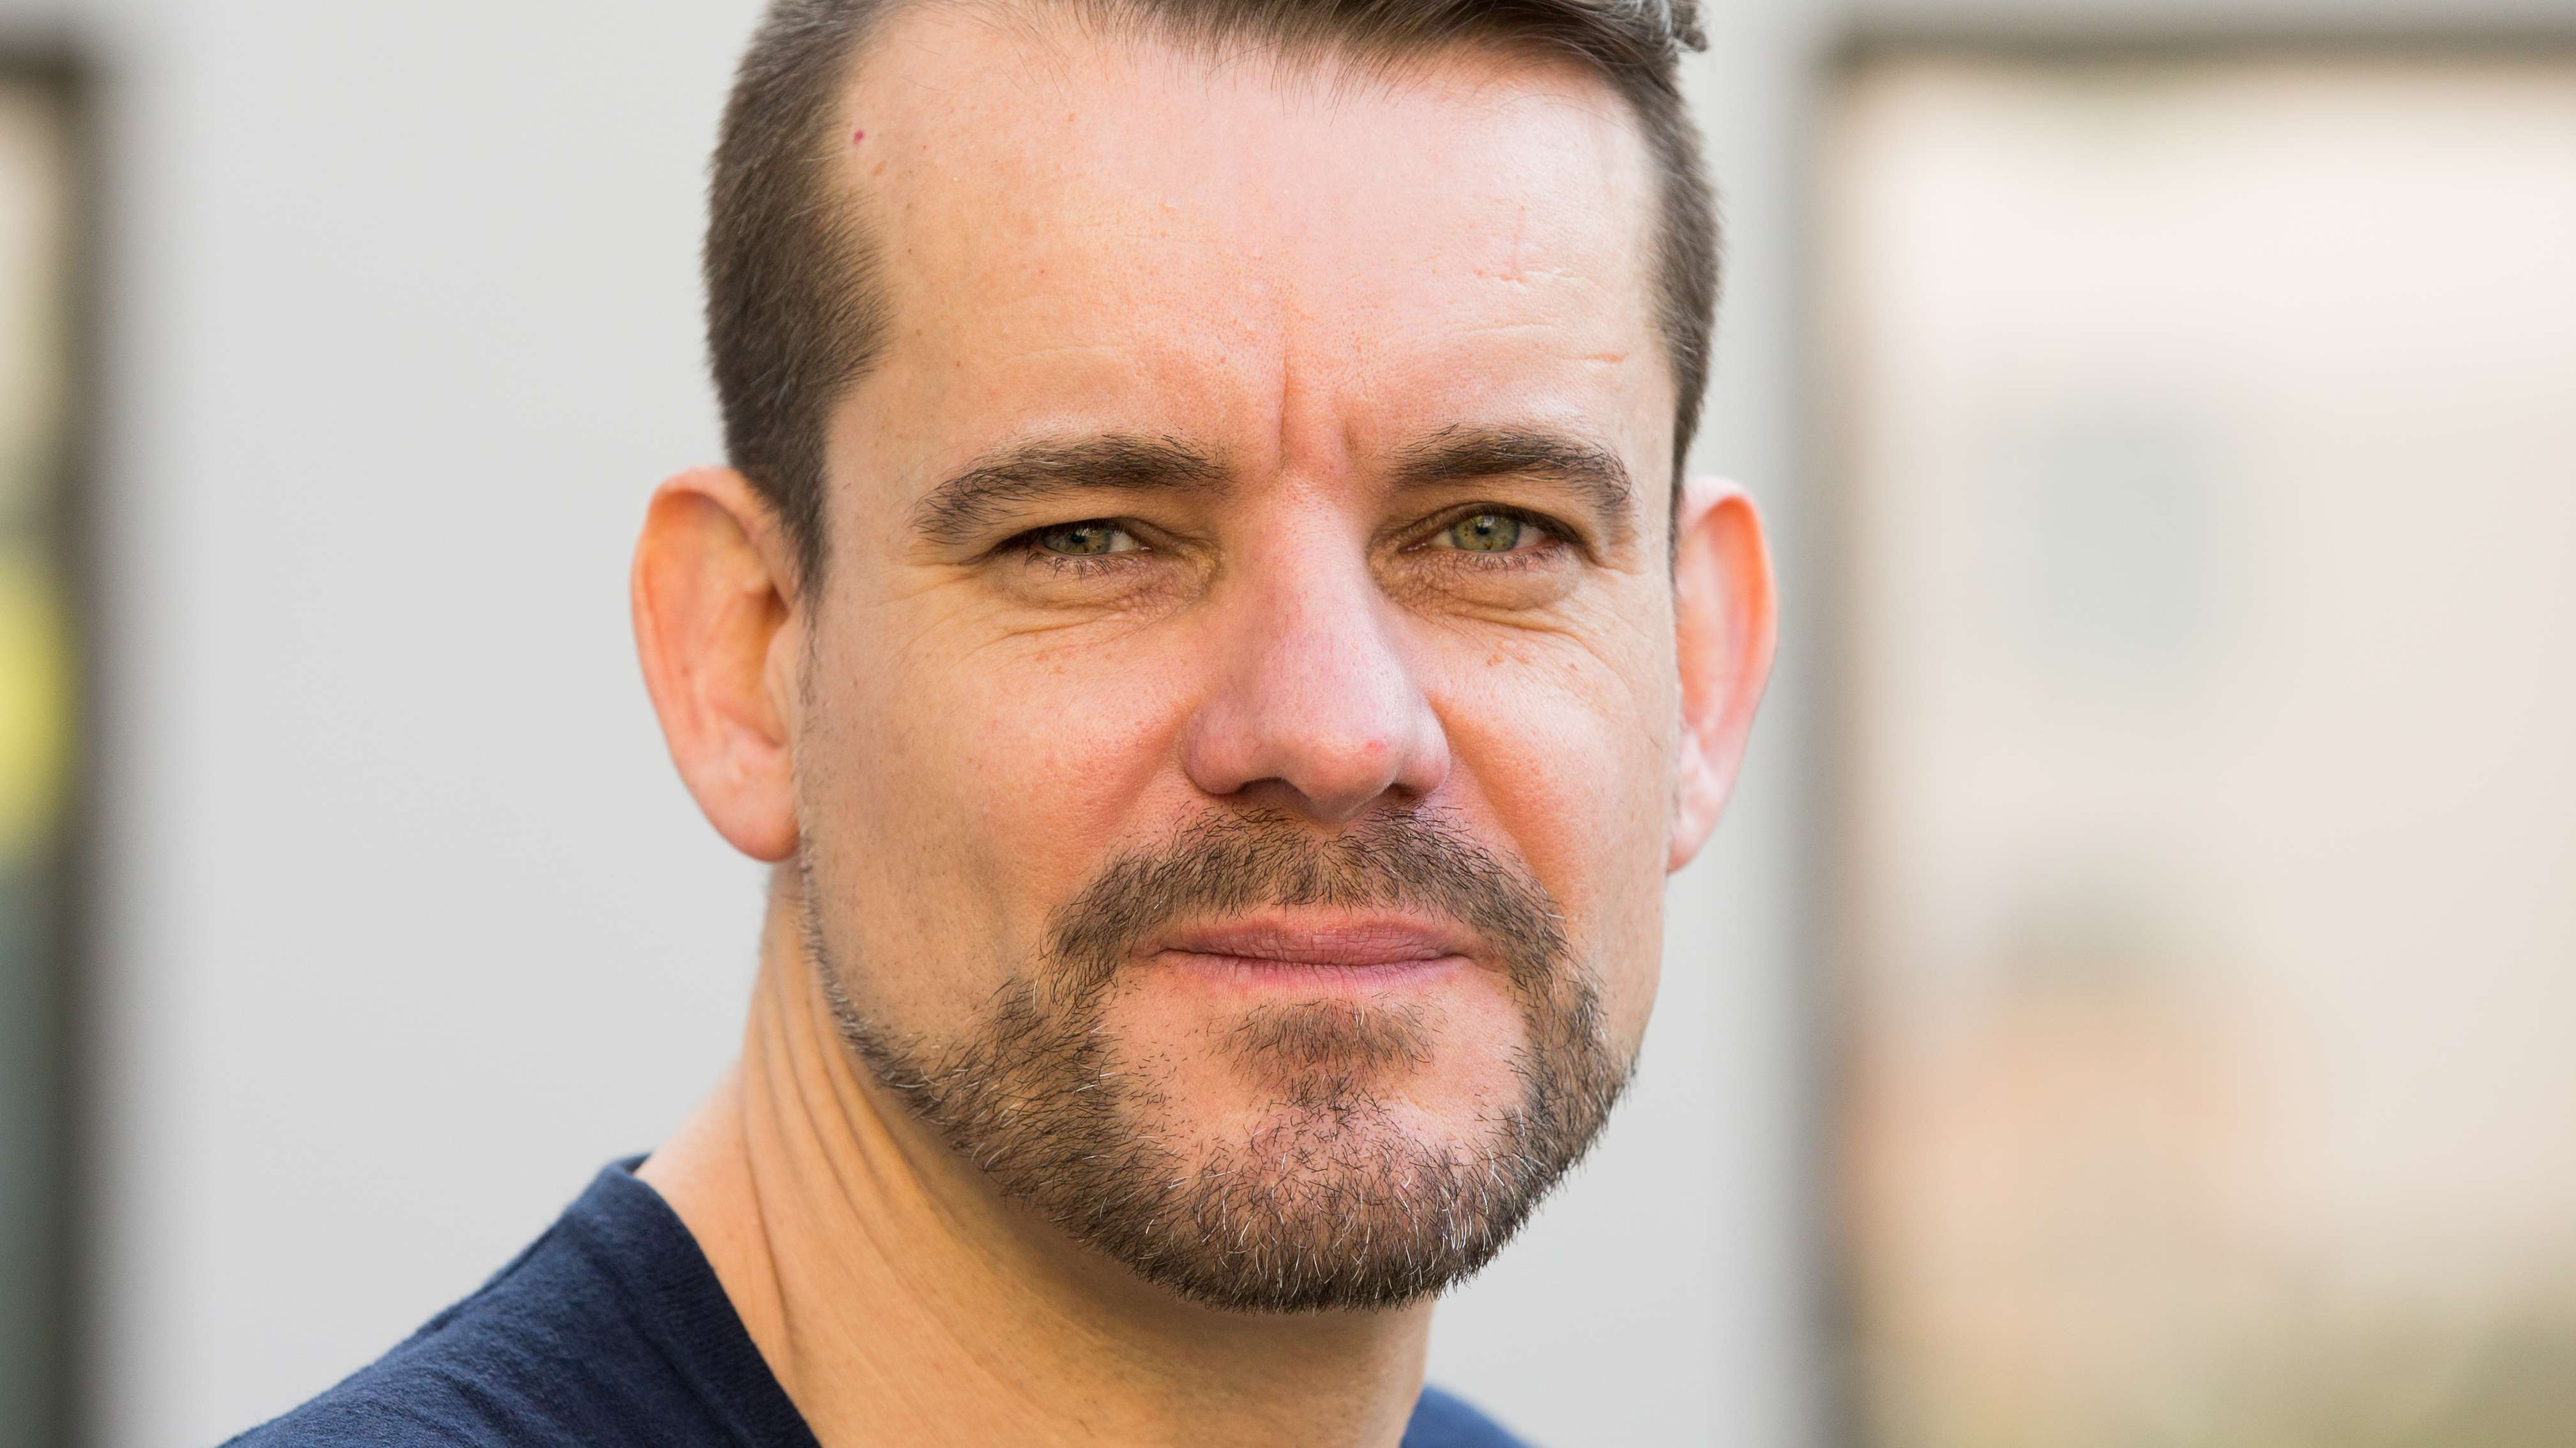 Kinderbuchautor Bart Moeyaert